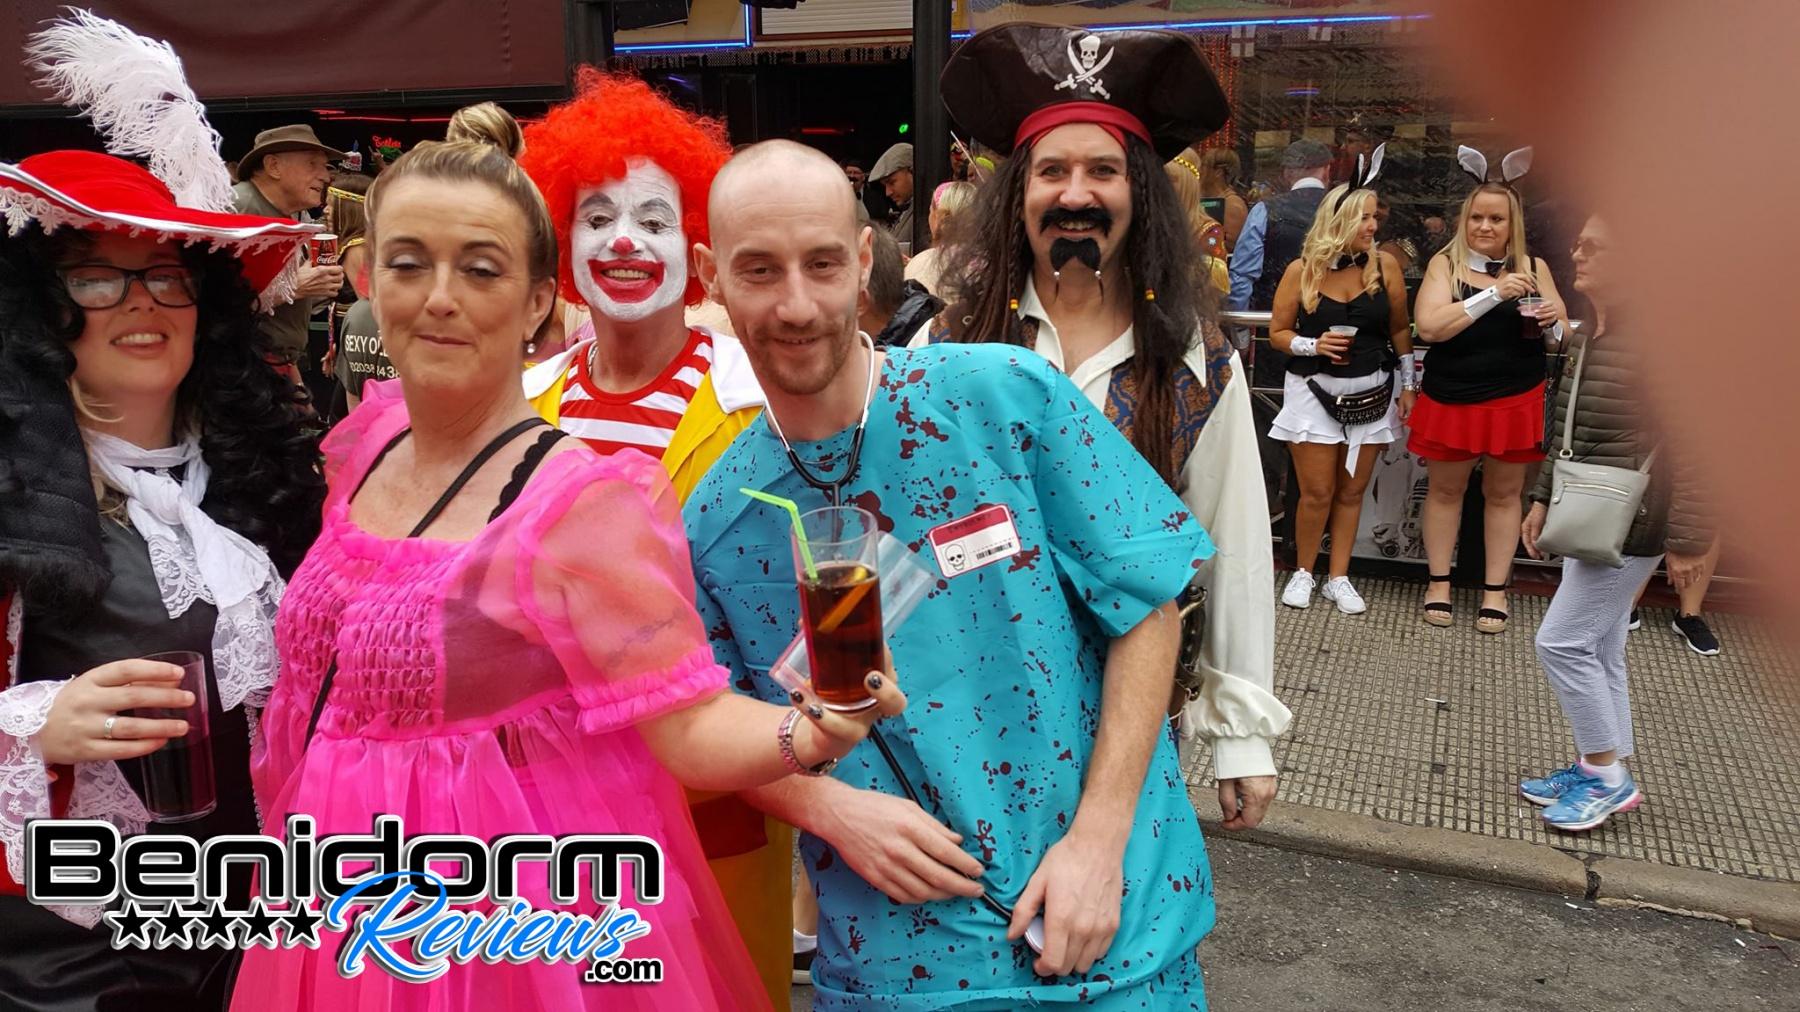 Benidorm-Fiestas-2019-Fancy-Dress-33